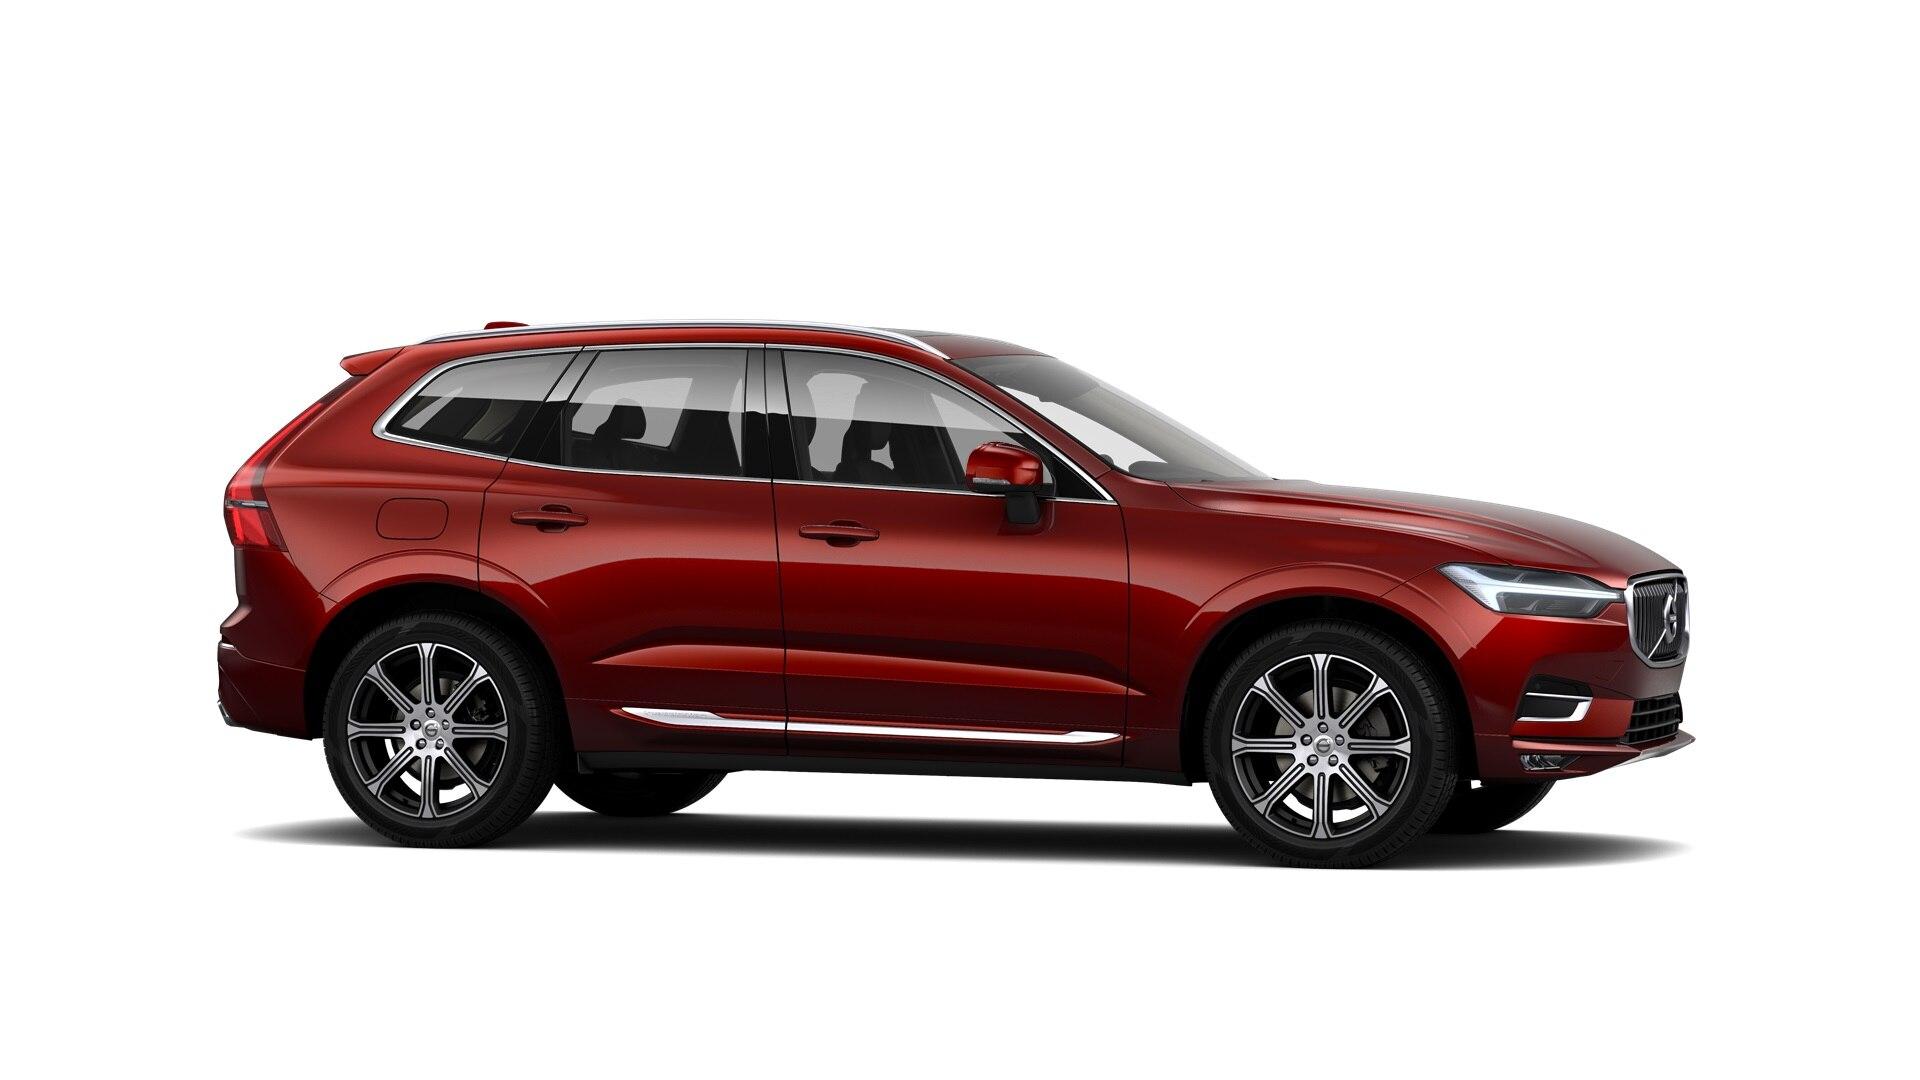 Volvo XC60 2019 Rouge fusion